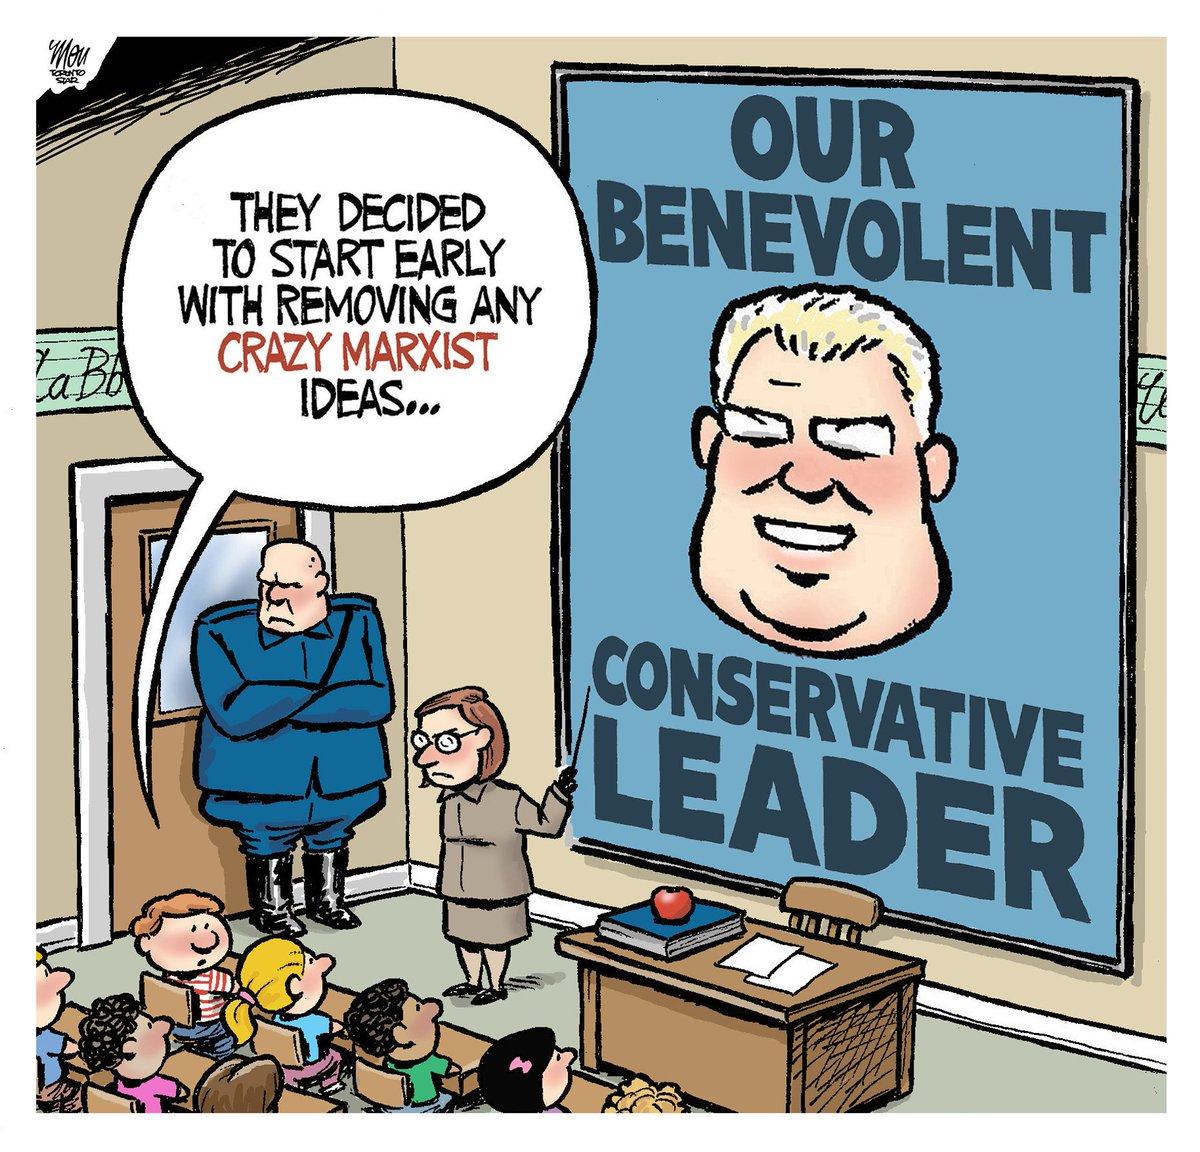 Here's Wednesday's #DougFord cartoon in @TorontoStar